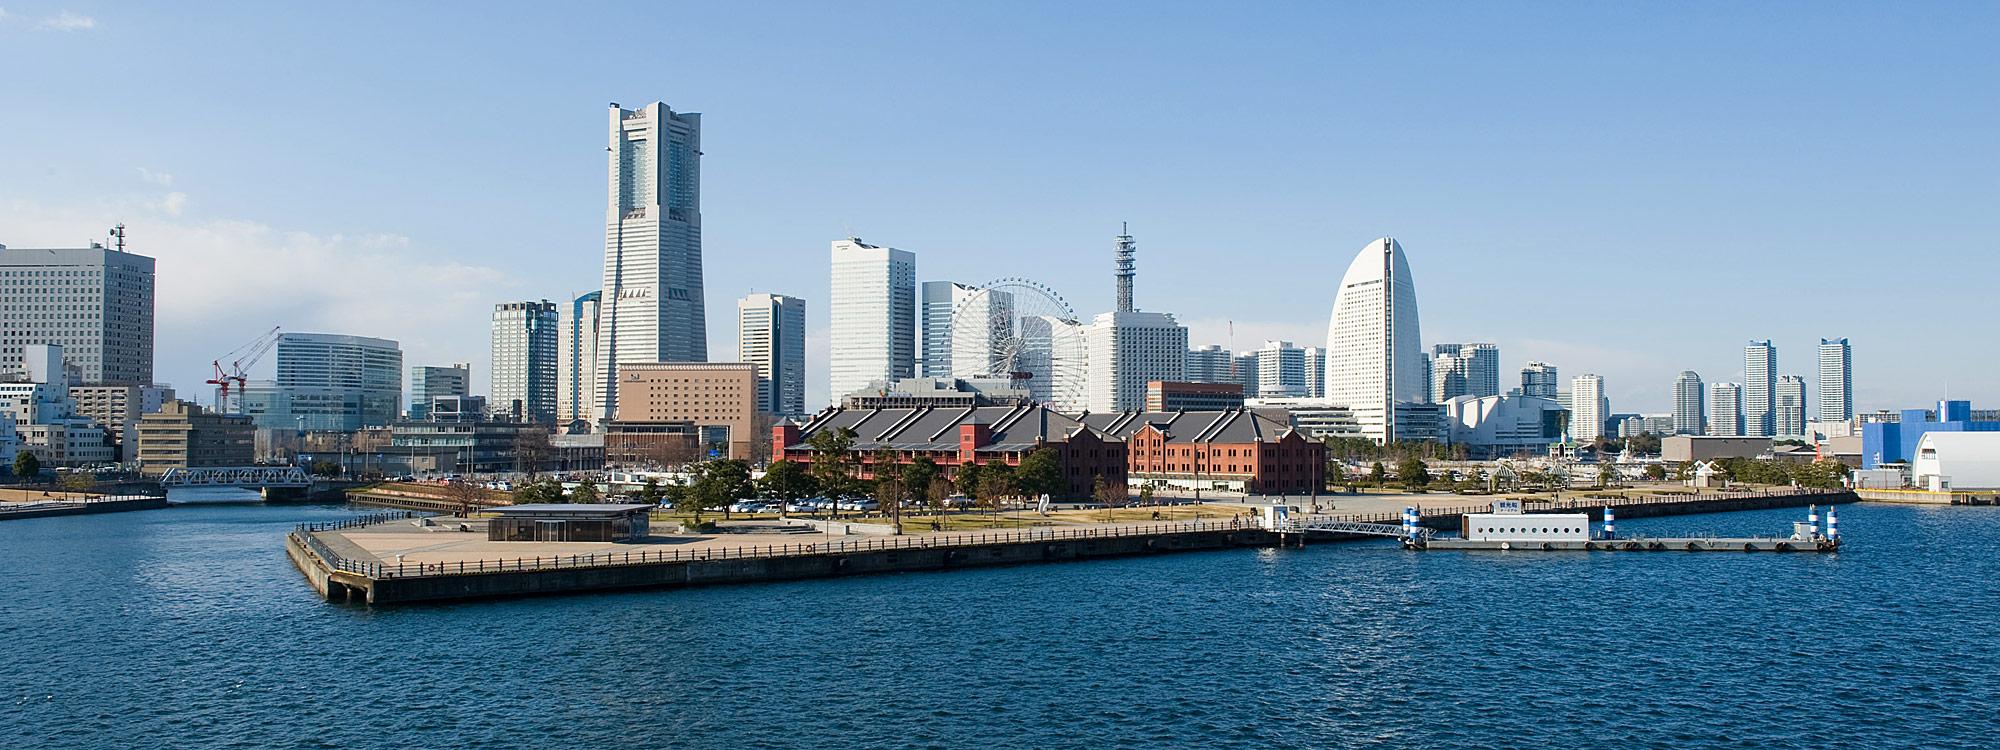 Trienal de Yokohama